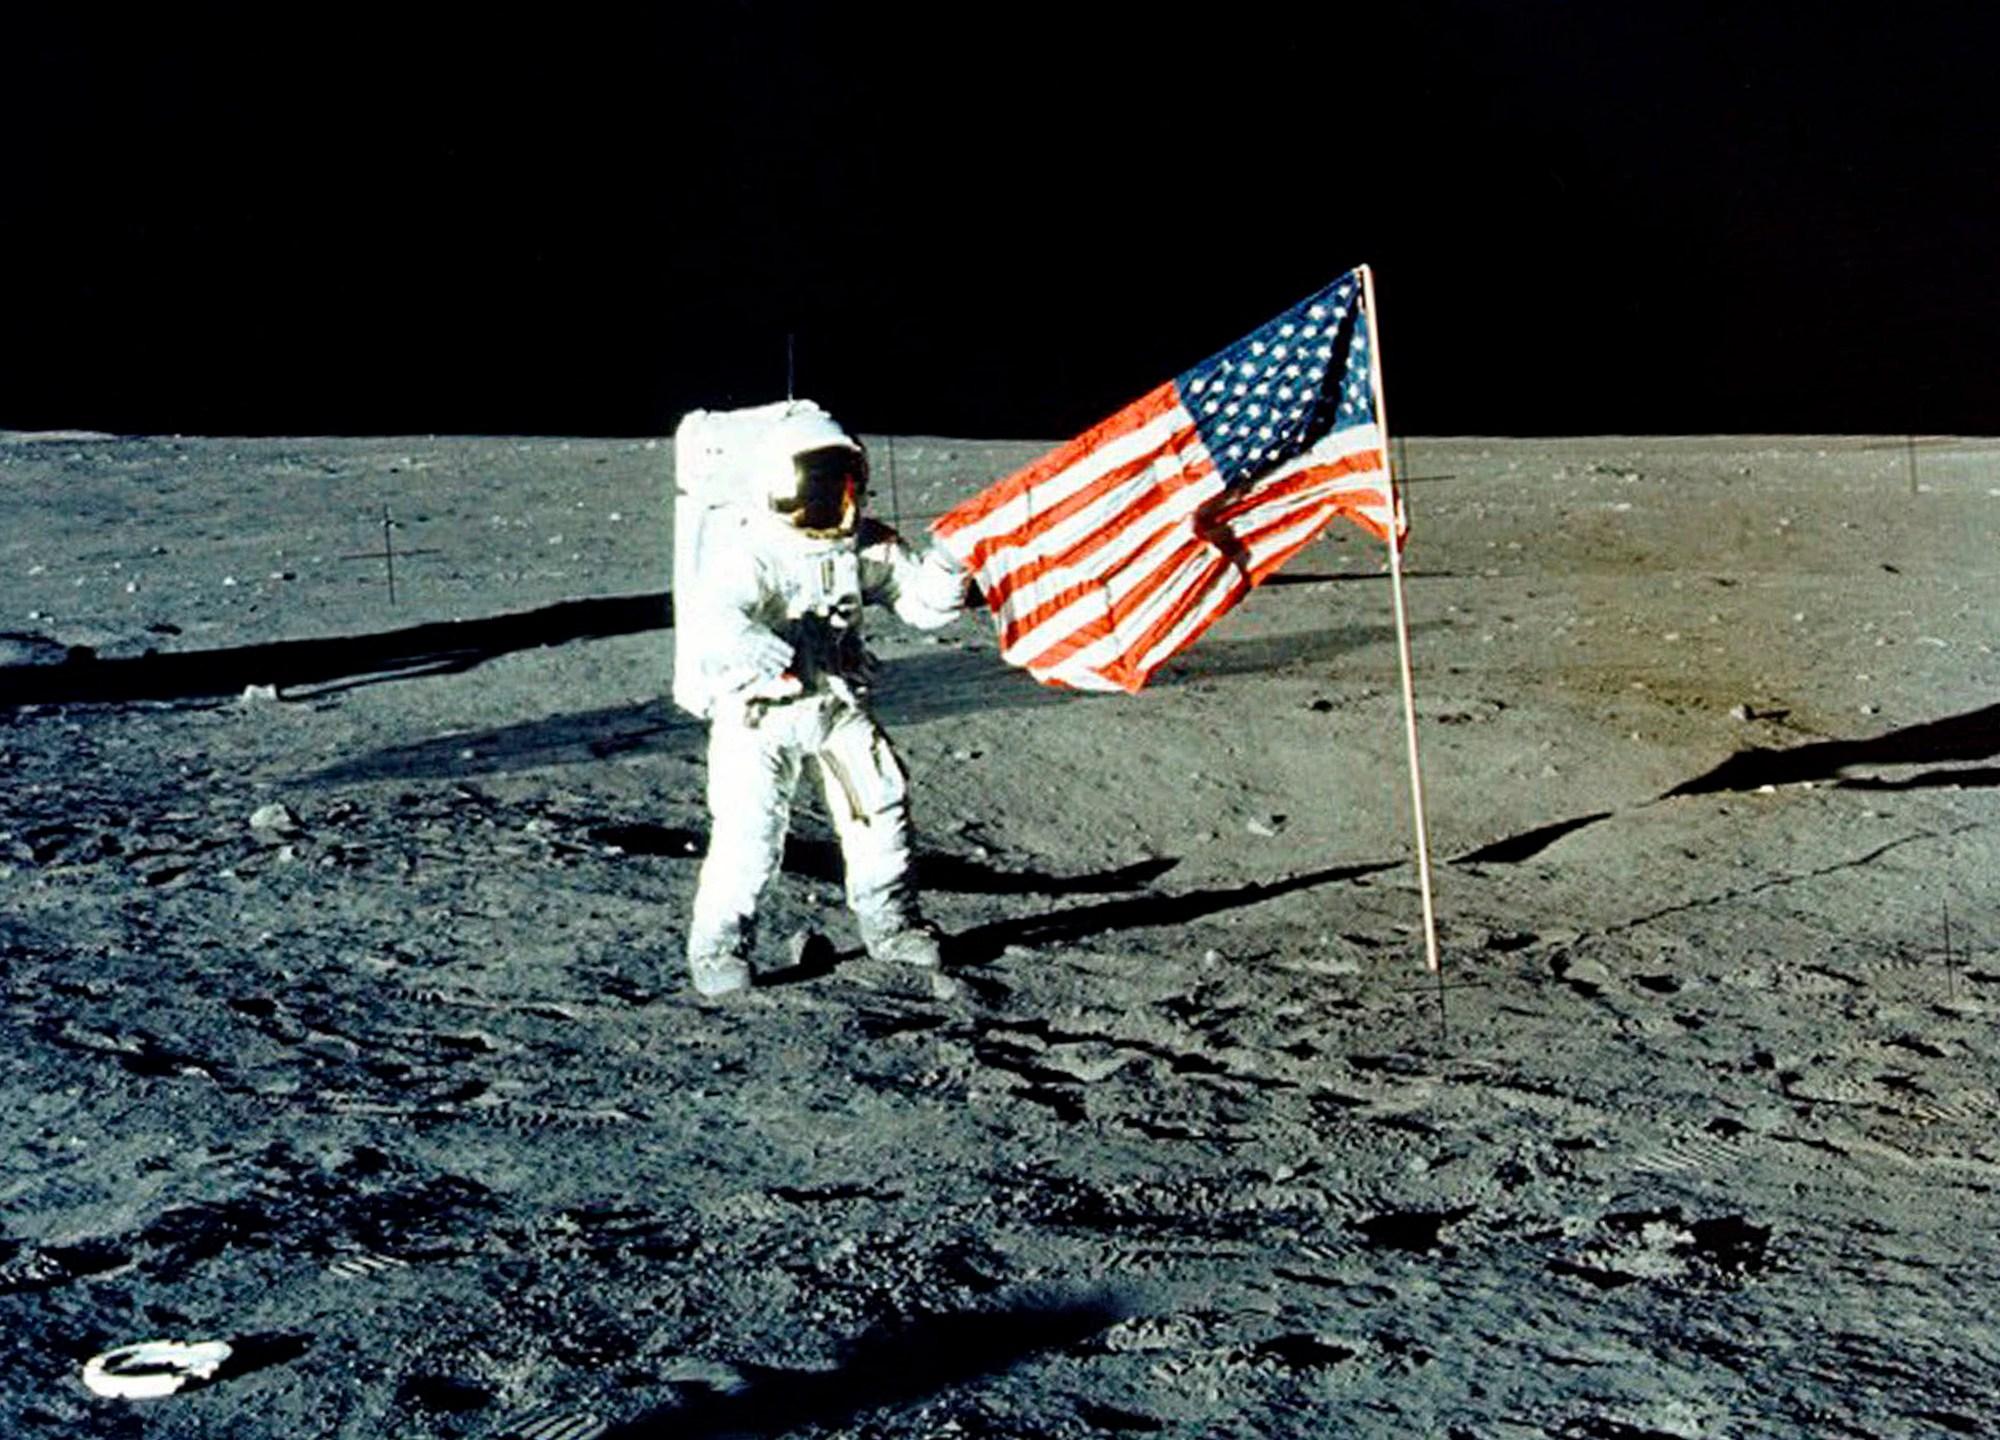 Moon_Landing_Poll_08855-159532.jpg02828459